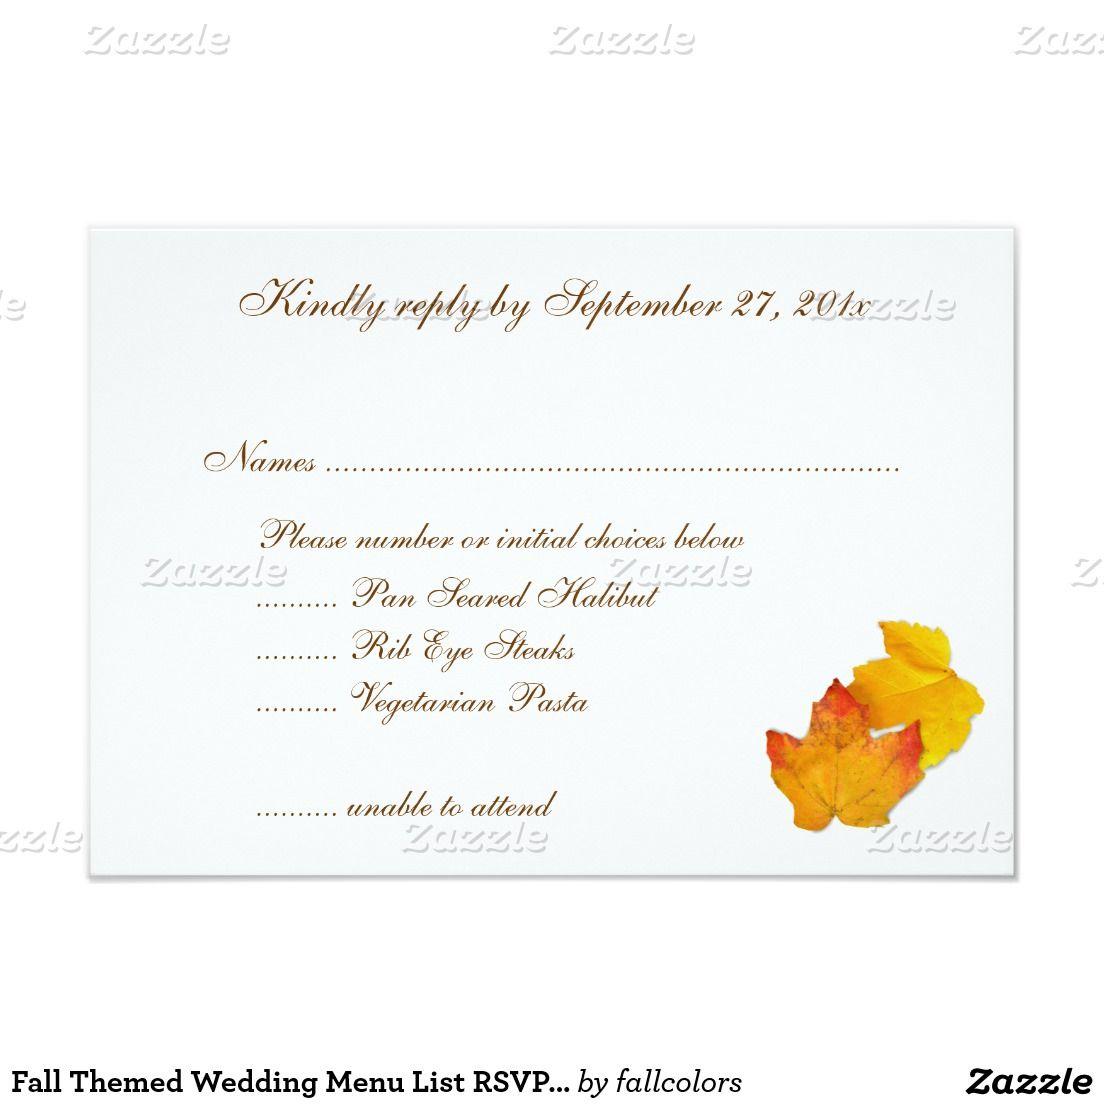 Fall Themed Wedding Menu List RSVP Cards | Menu list, Wedding menu ...